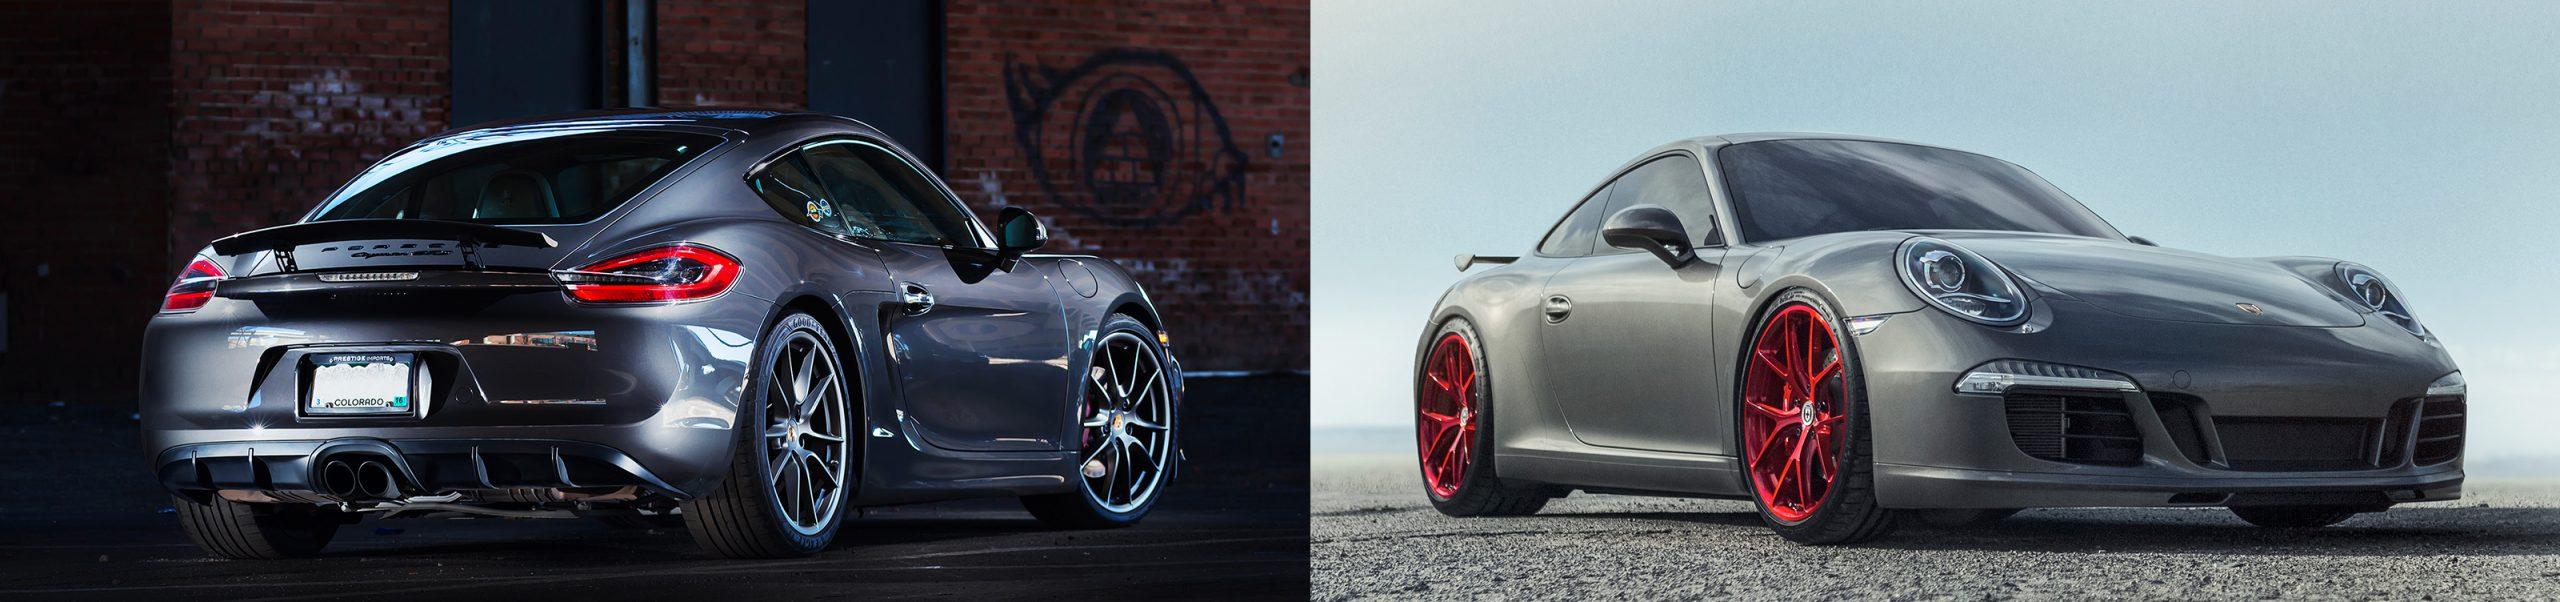 Porsche Tuning & Aftermarket Performance Parts